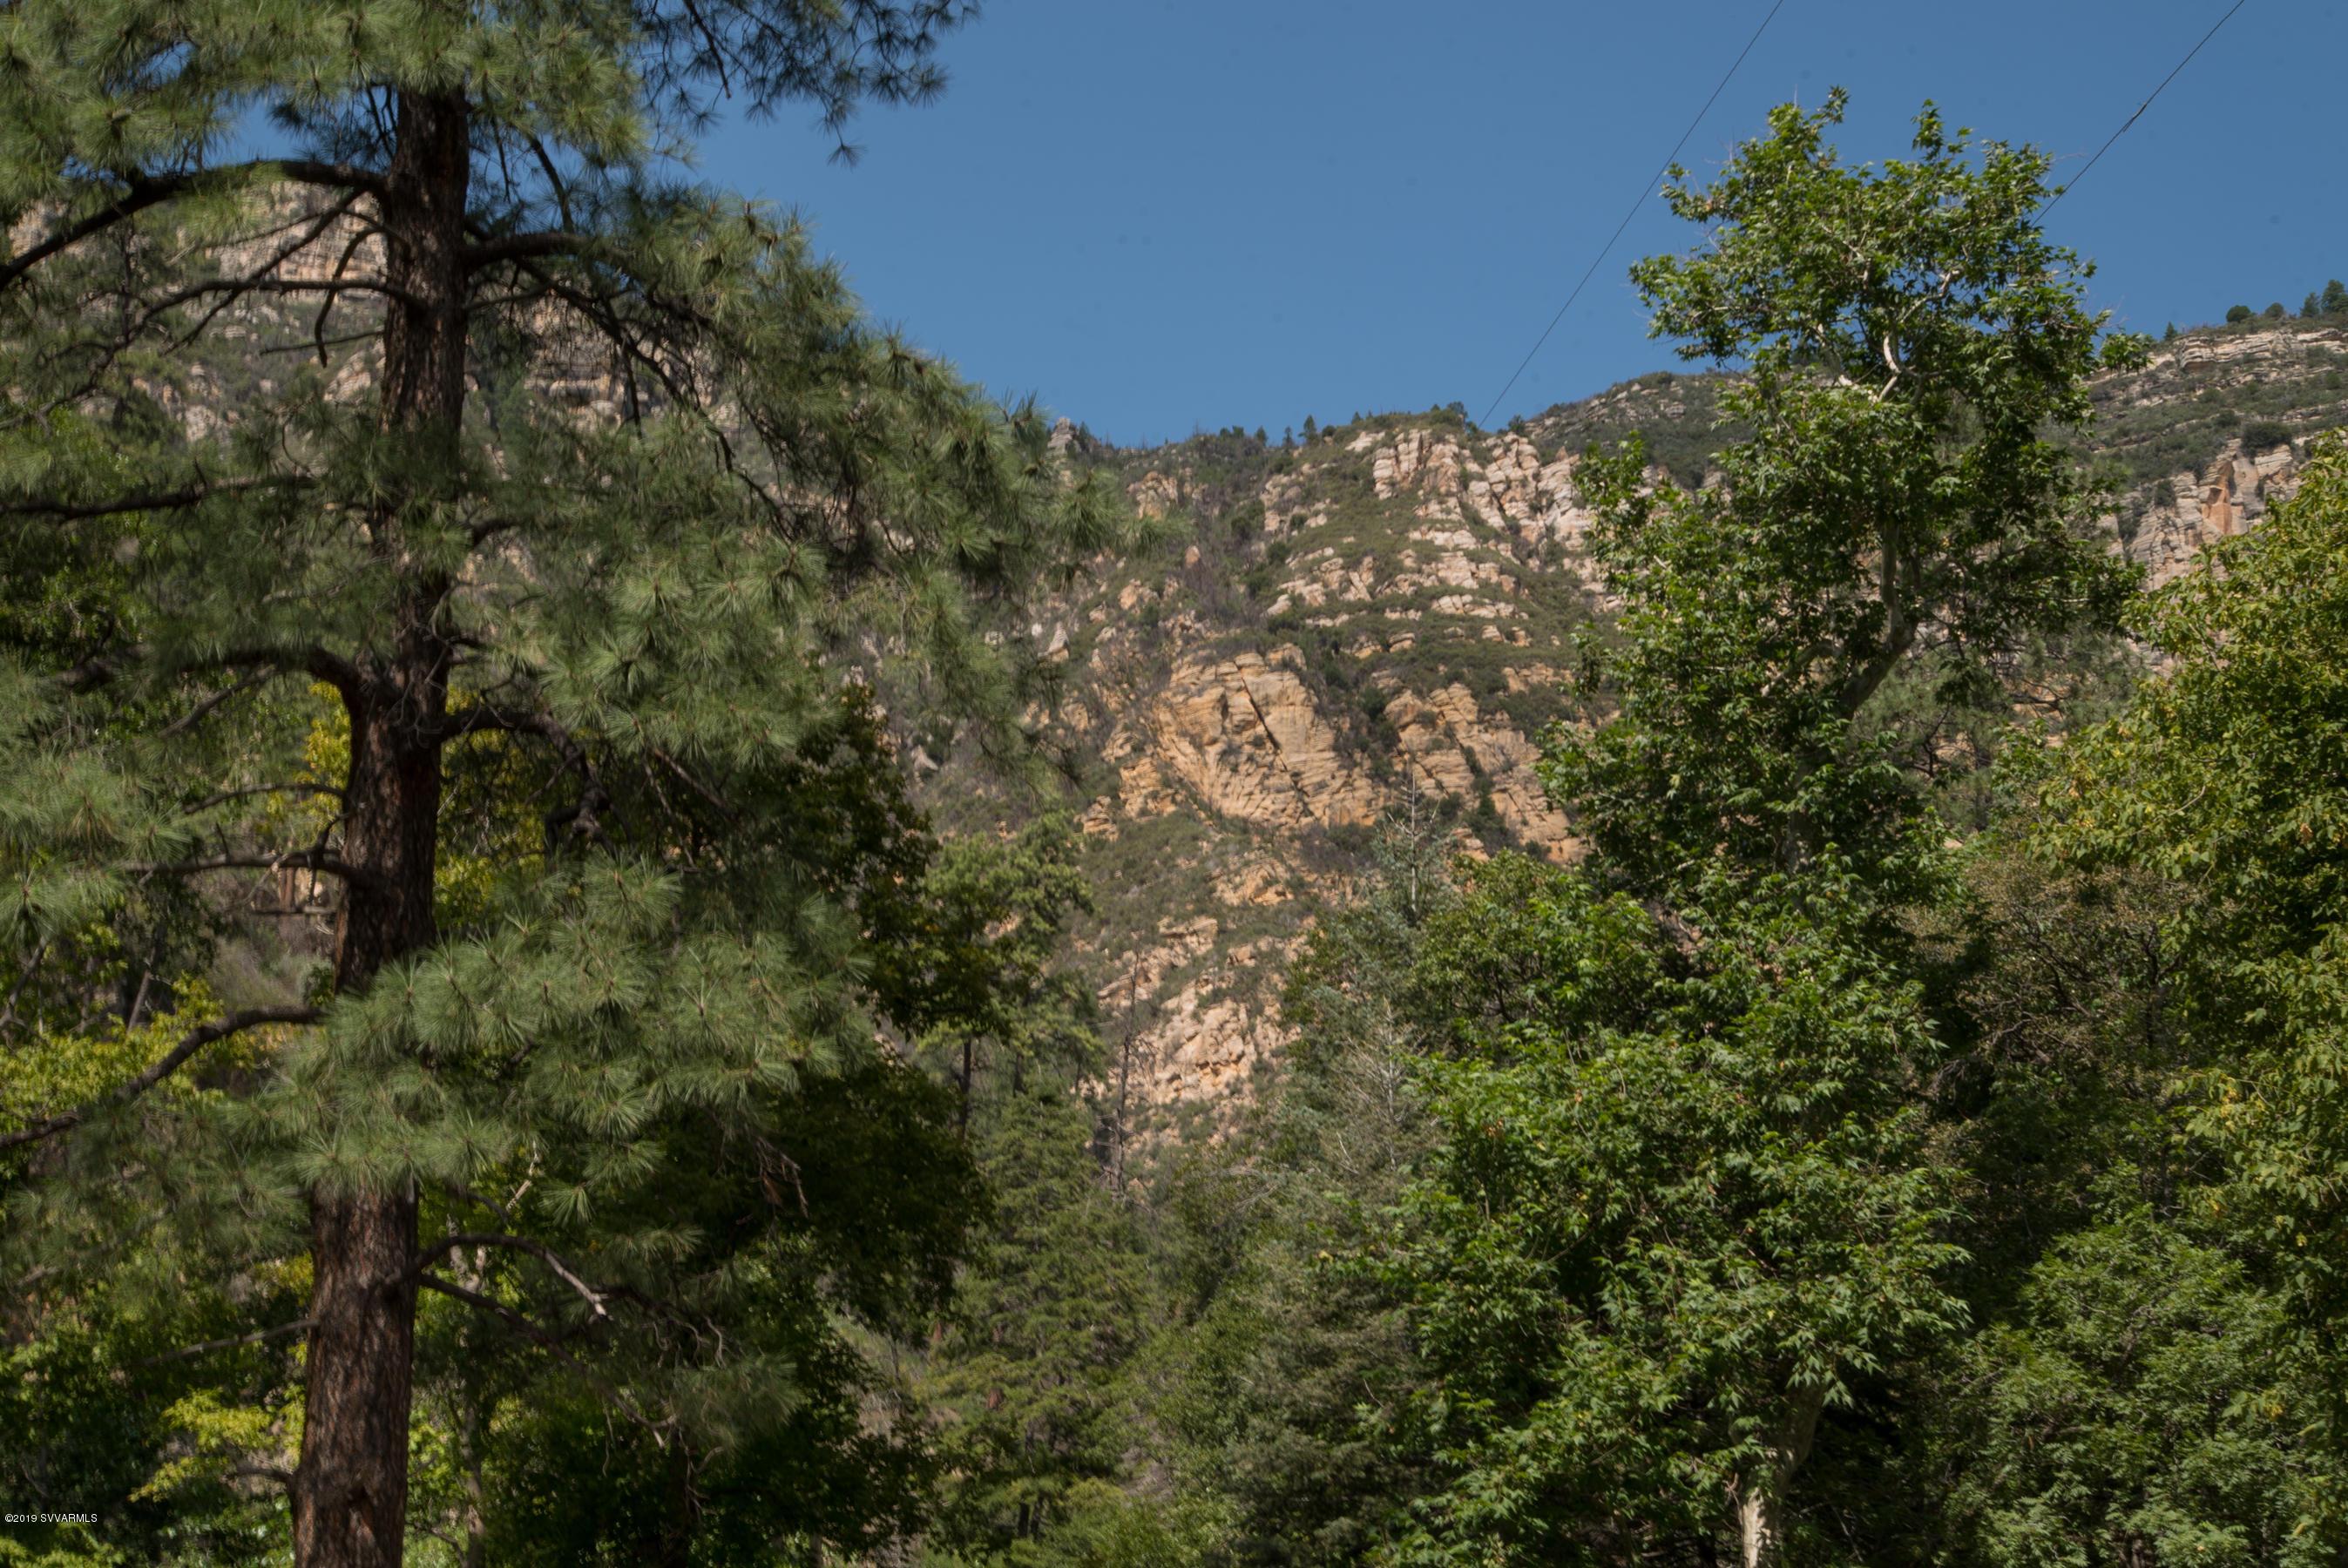 9440 N State Route 89a Sedona, AZ 86336